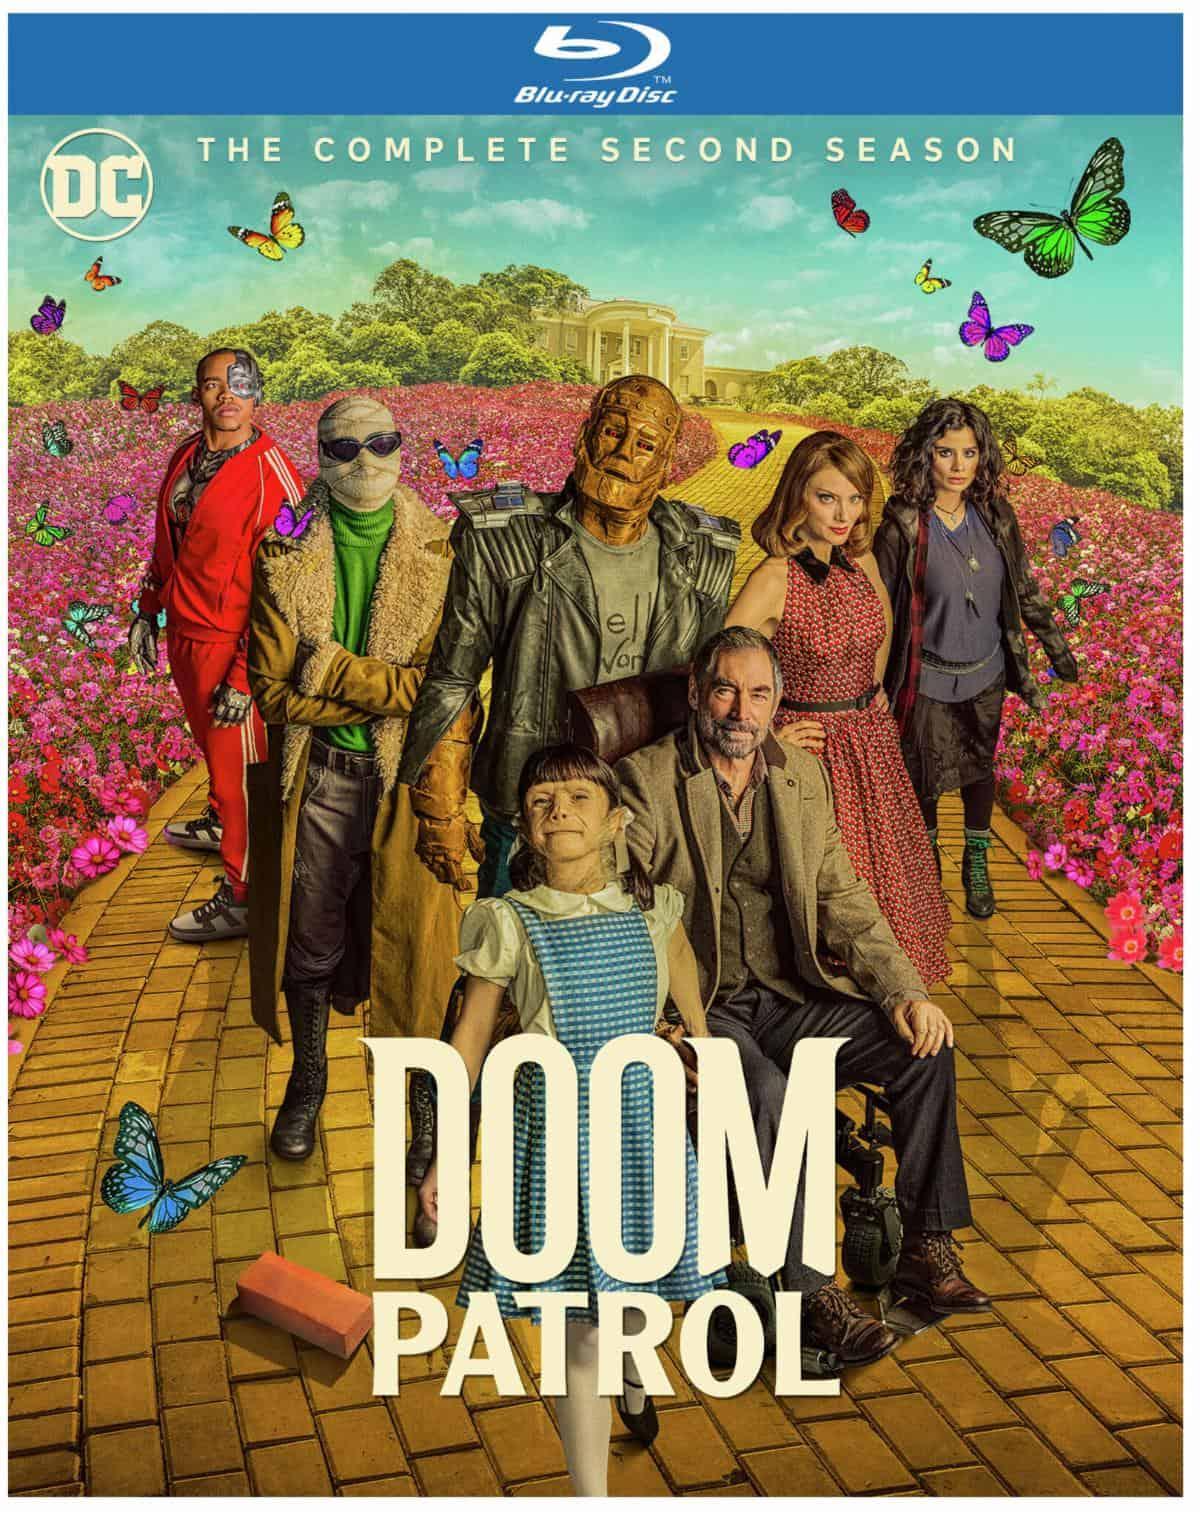 Sunday News: Warner Brothers Blu-rays, Wolfwalkers, Ultraman, Arrow 7